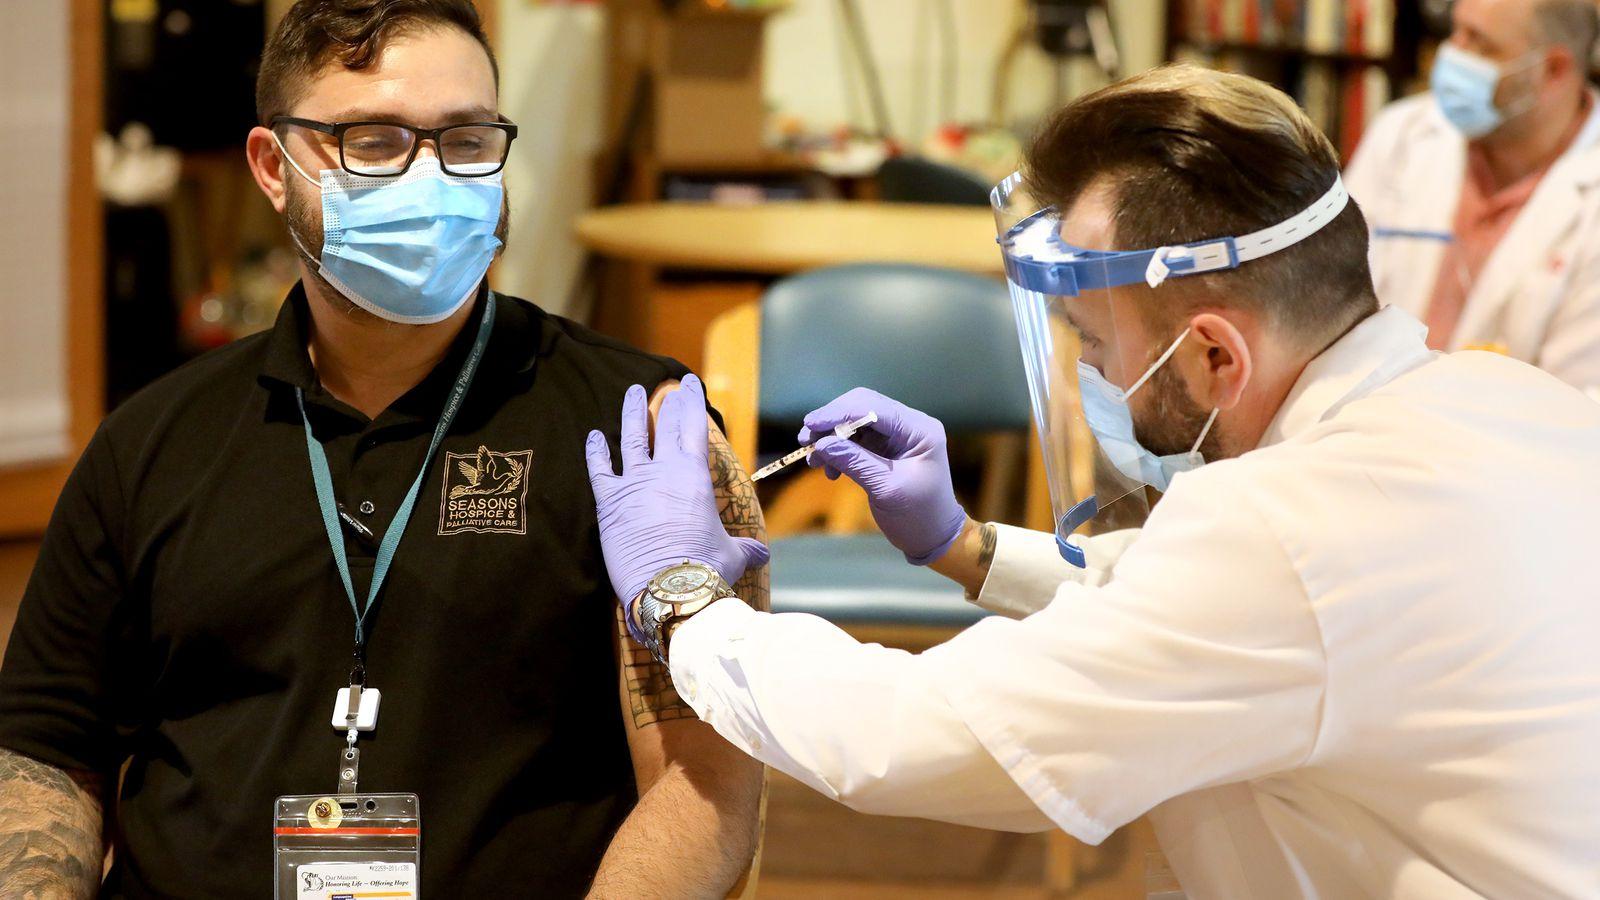 Majority of Florida's long-term care staffers refused coronavirus vaccine